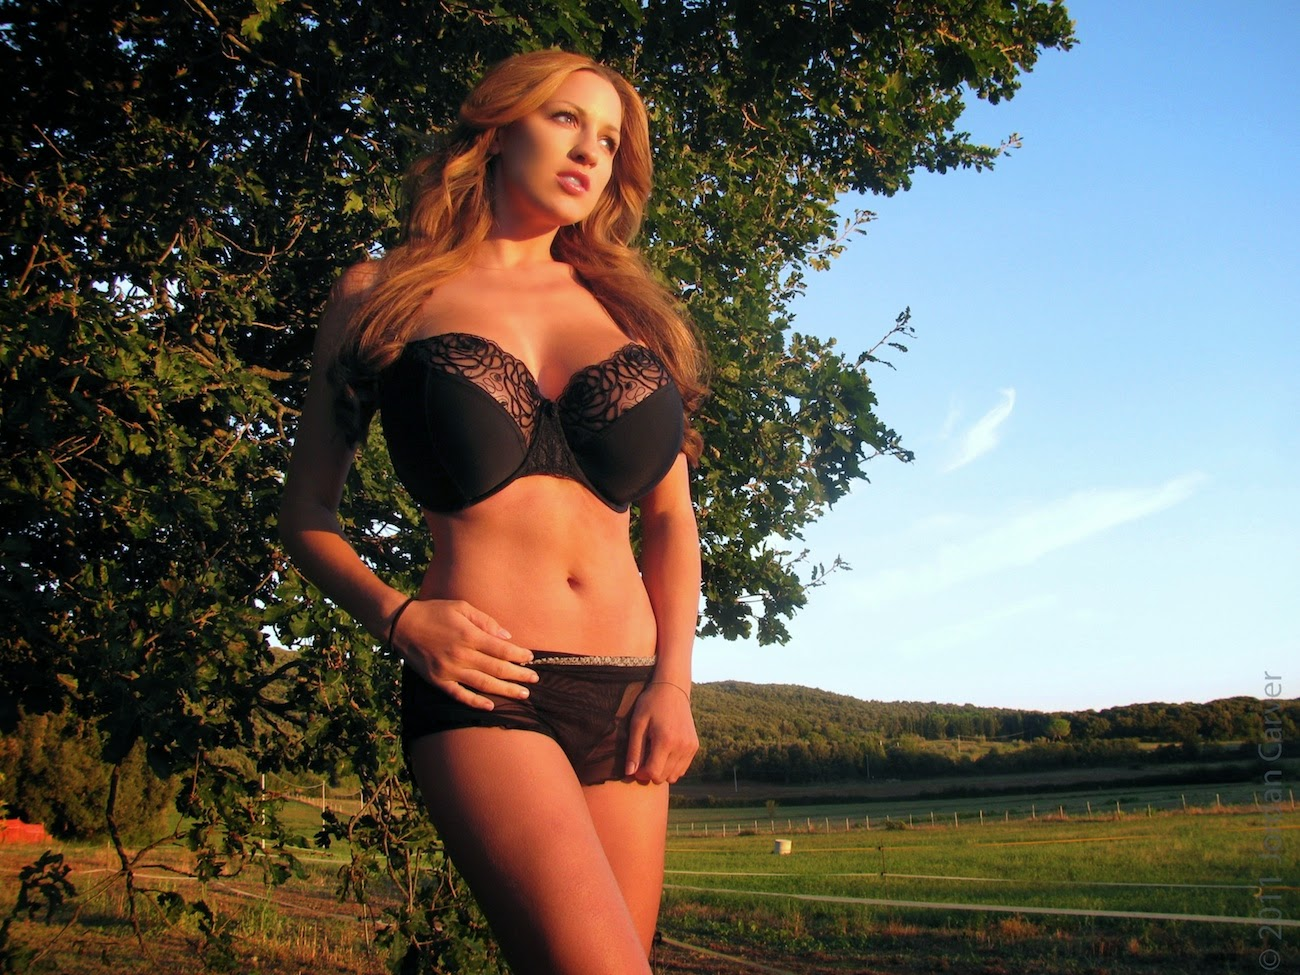 Jordan Carver Big Boobs In Black See Through Bra And Panty -7092